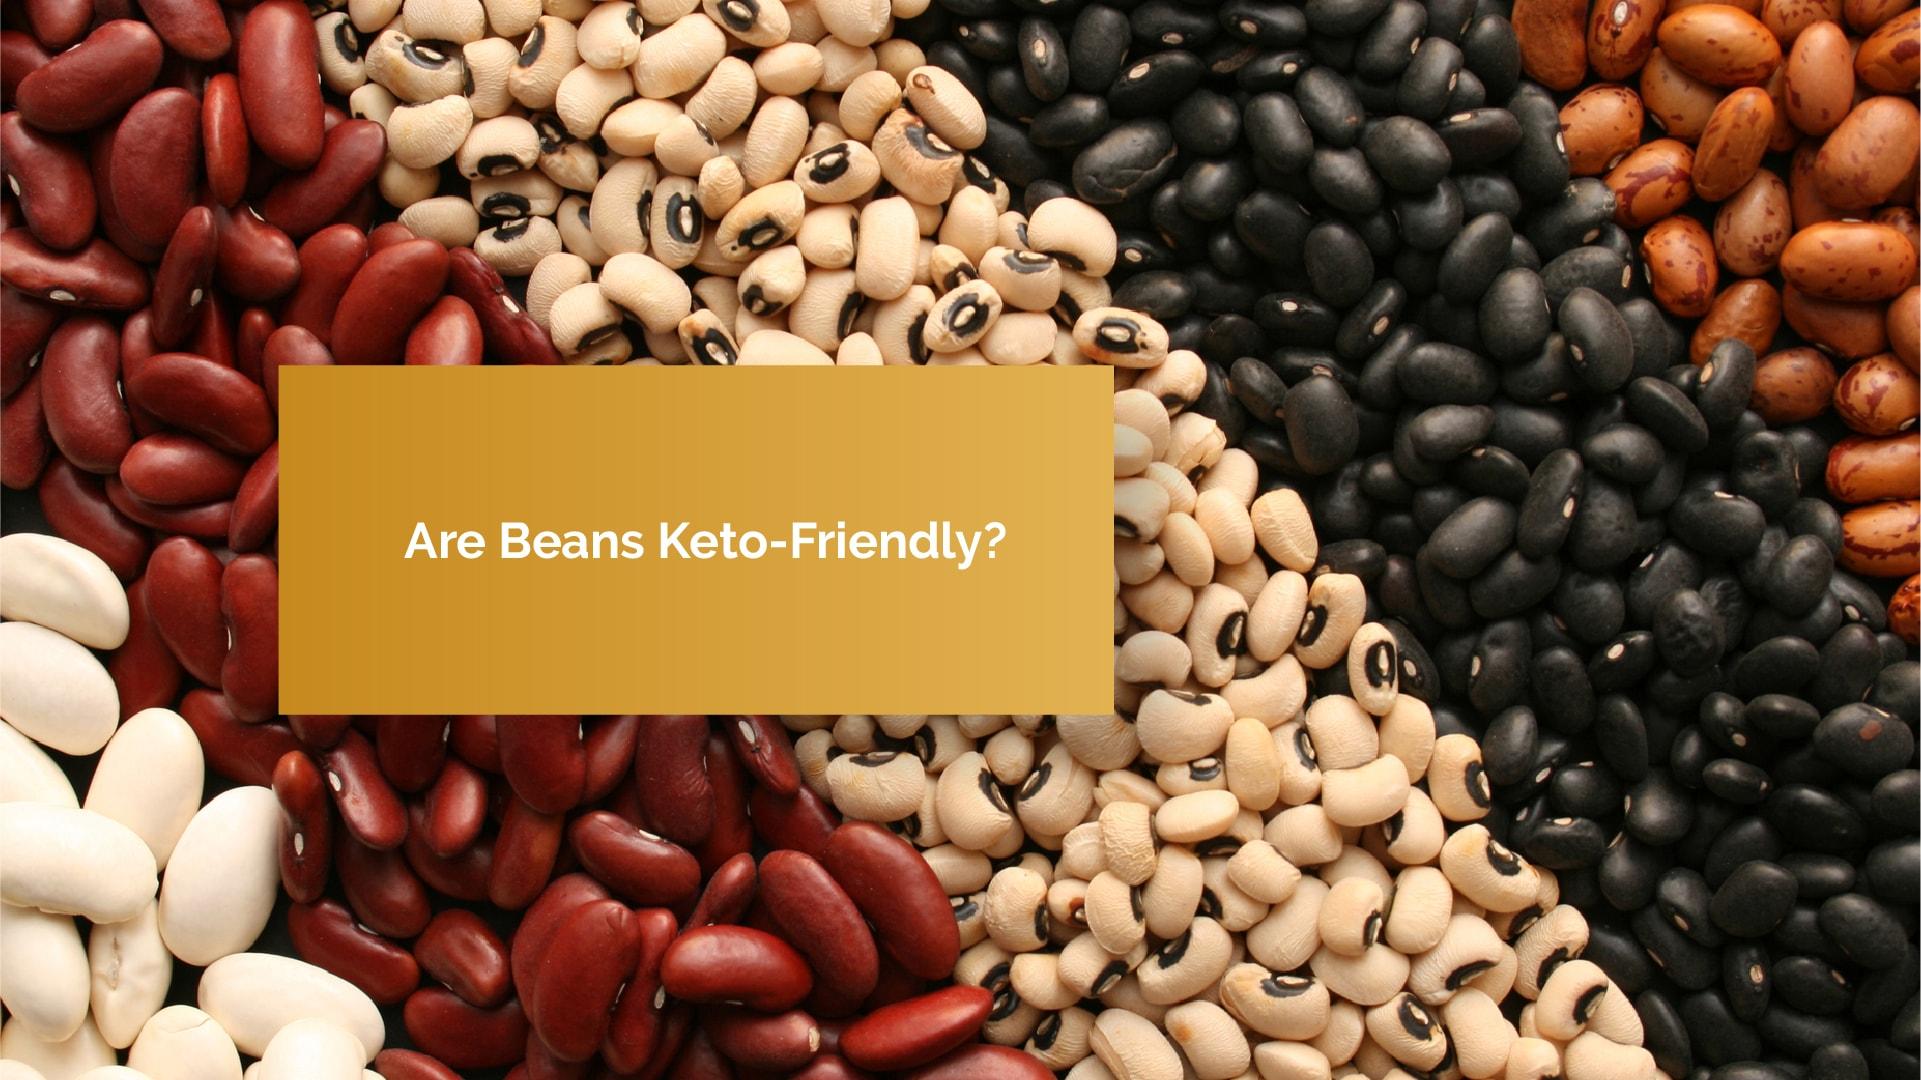 Are Beans Keto-Friendly? What Makes Beans an Unfriendly Keto Food?